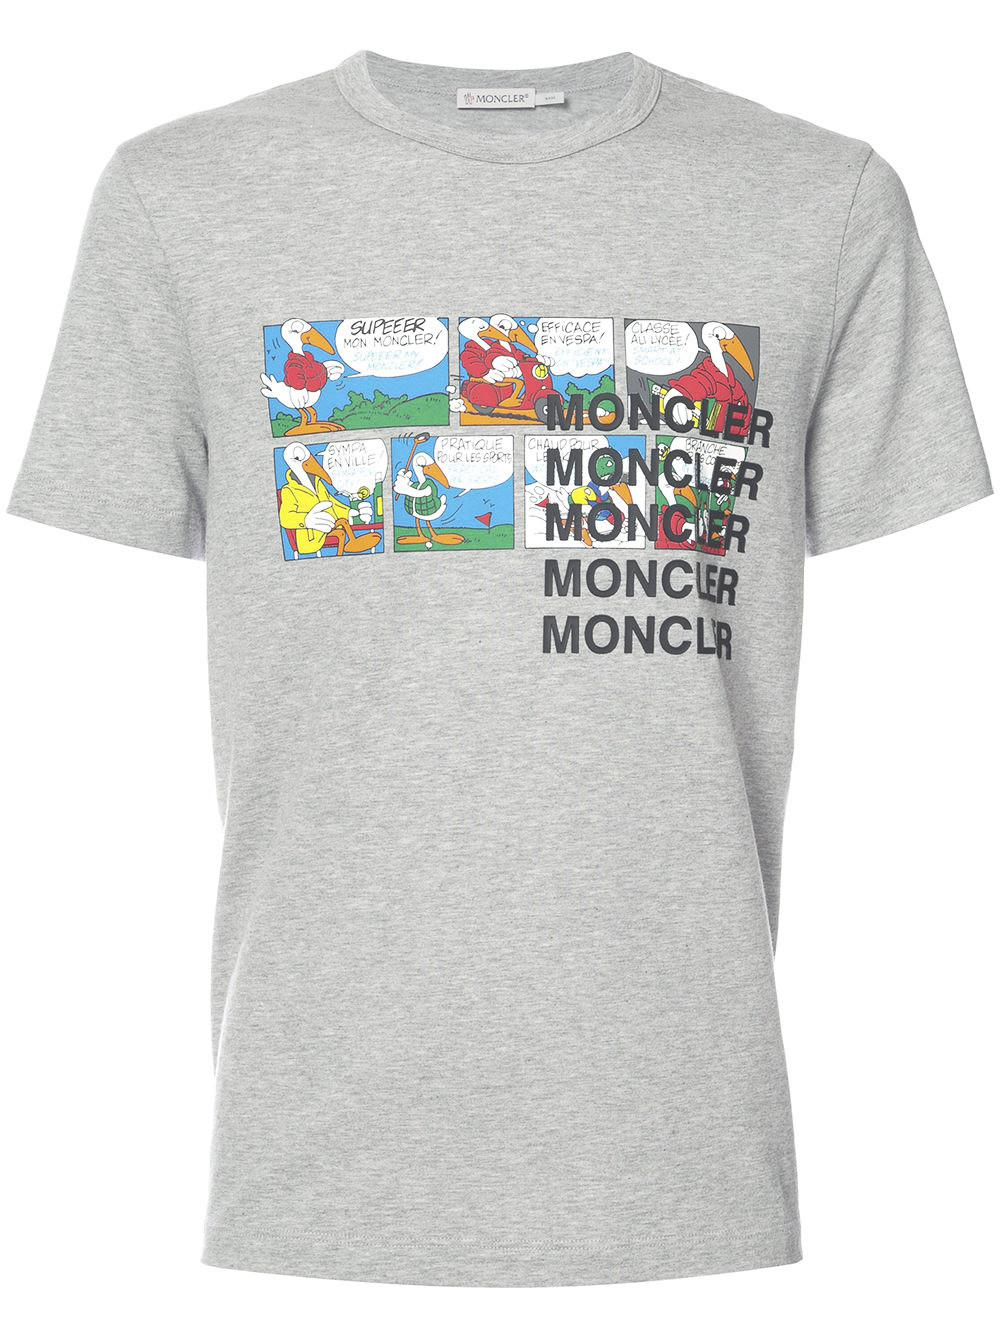 db5867dc5657 Moncler Cartoon Printed T-shirt for Men - Save 44% - Lyst